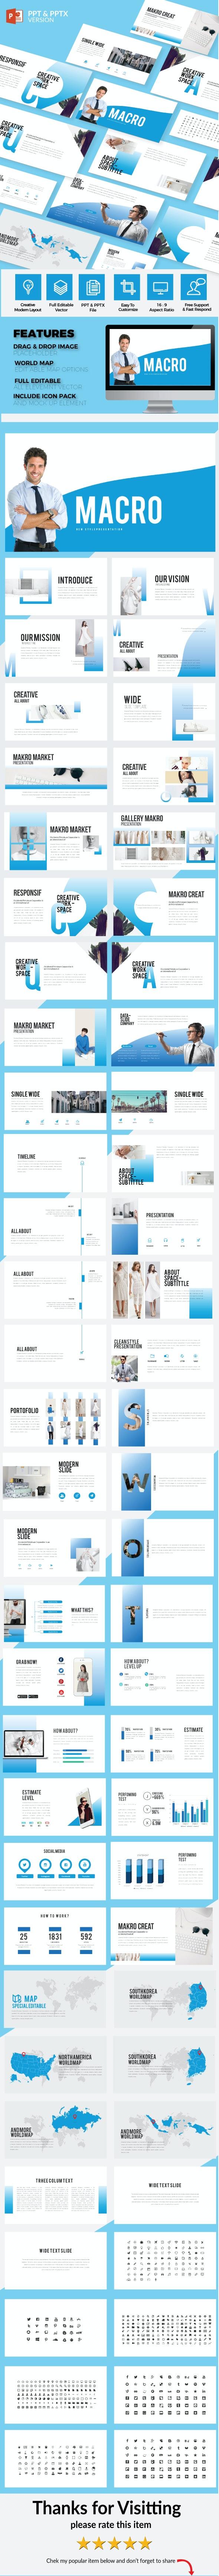 Macro - Multipurpose Presentation Template - Creative PowerPoint Templates